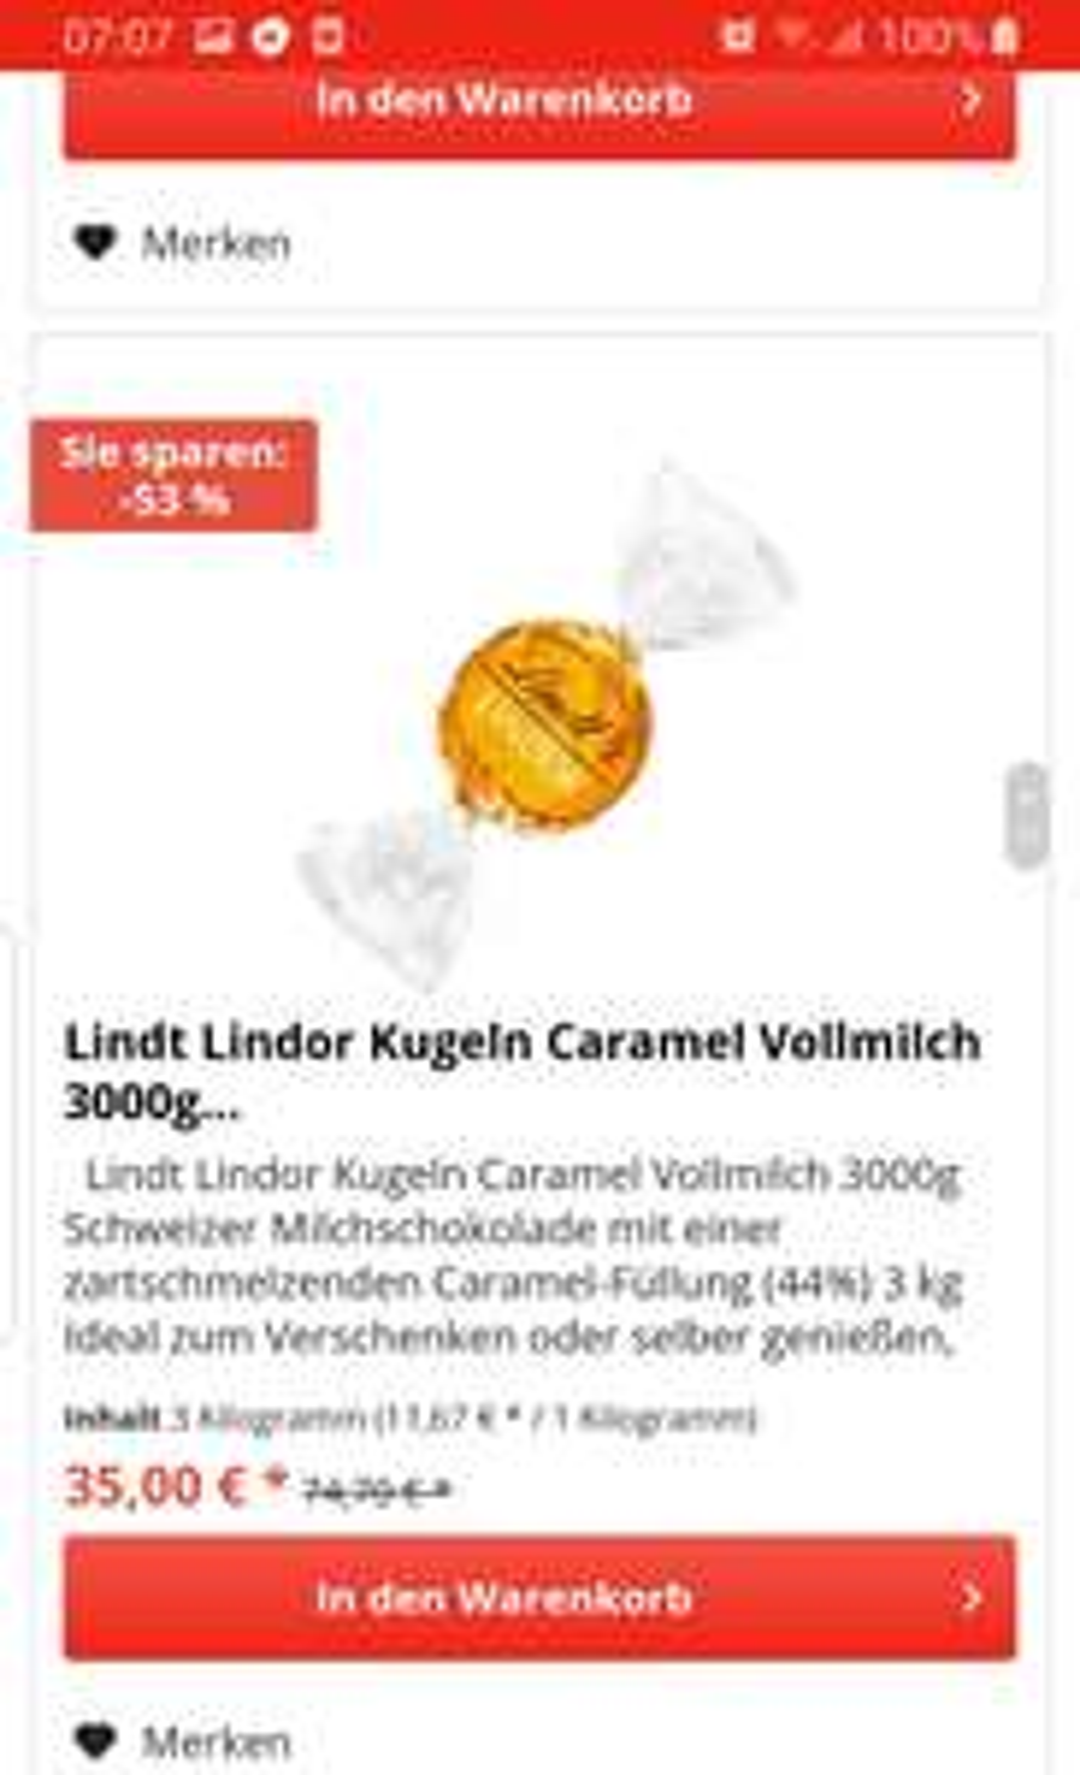 Lindt Lindor Tafeln für 11,69/kg (inkl. Versand), Karamell Kugeln für 13,66/kg